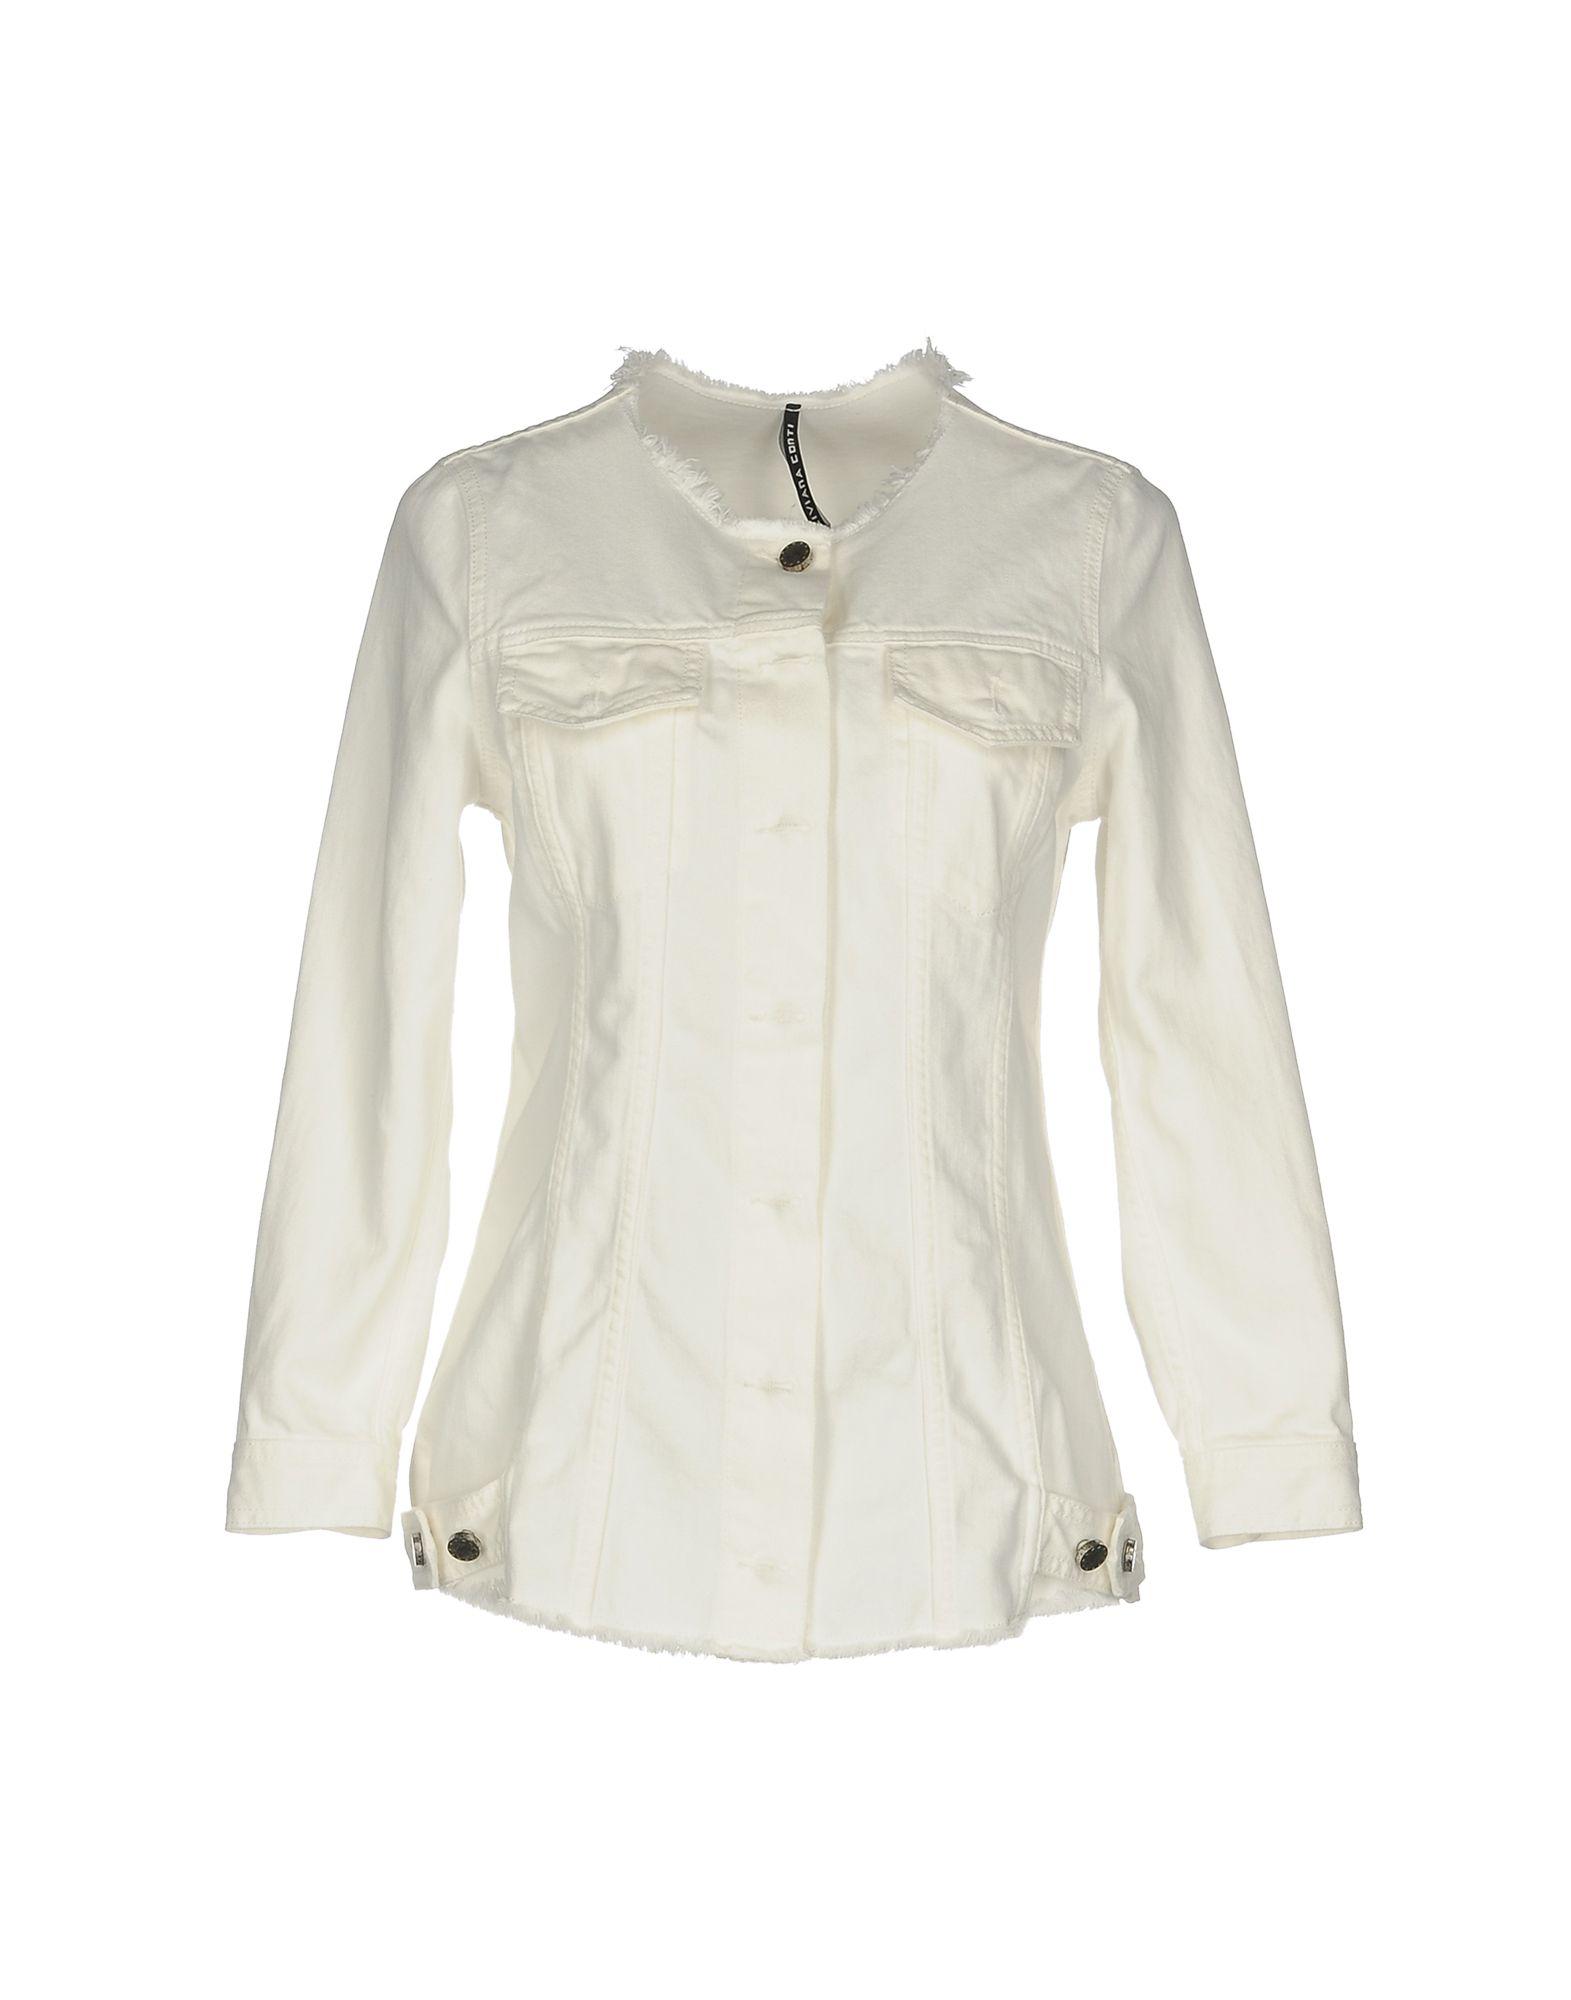 LIVIANA CONTI Джинсовая верхняя одежда верхняя одежда